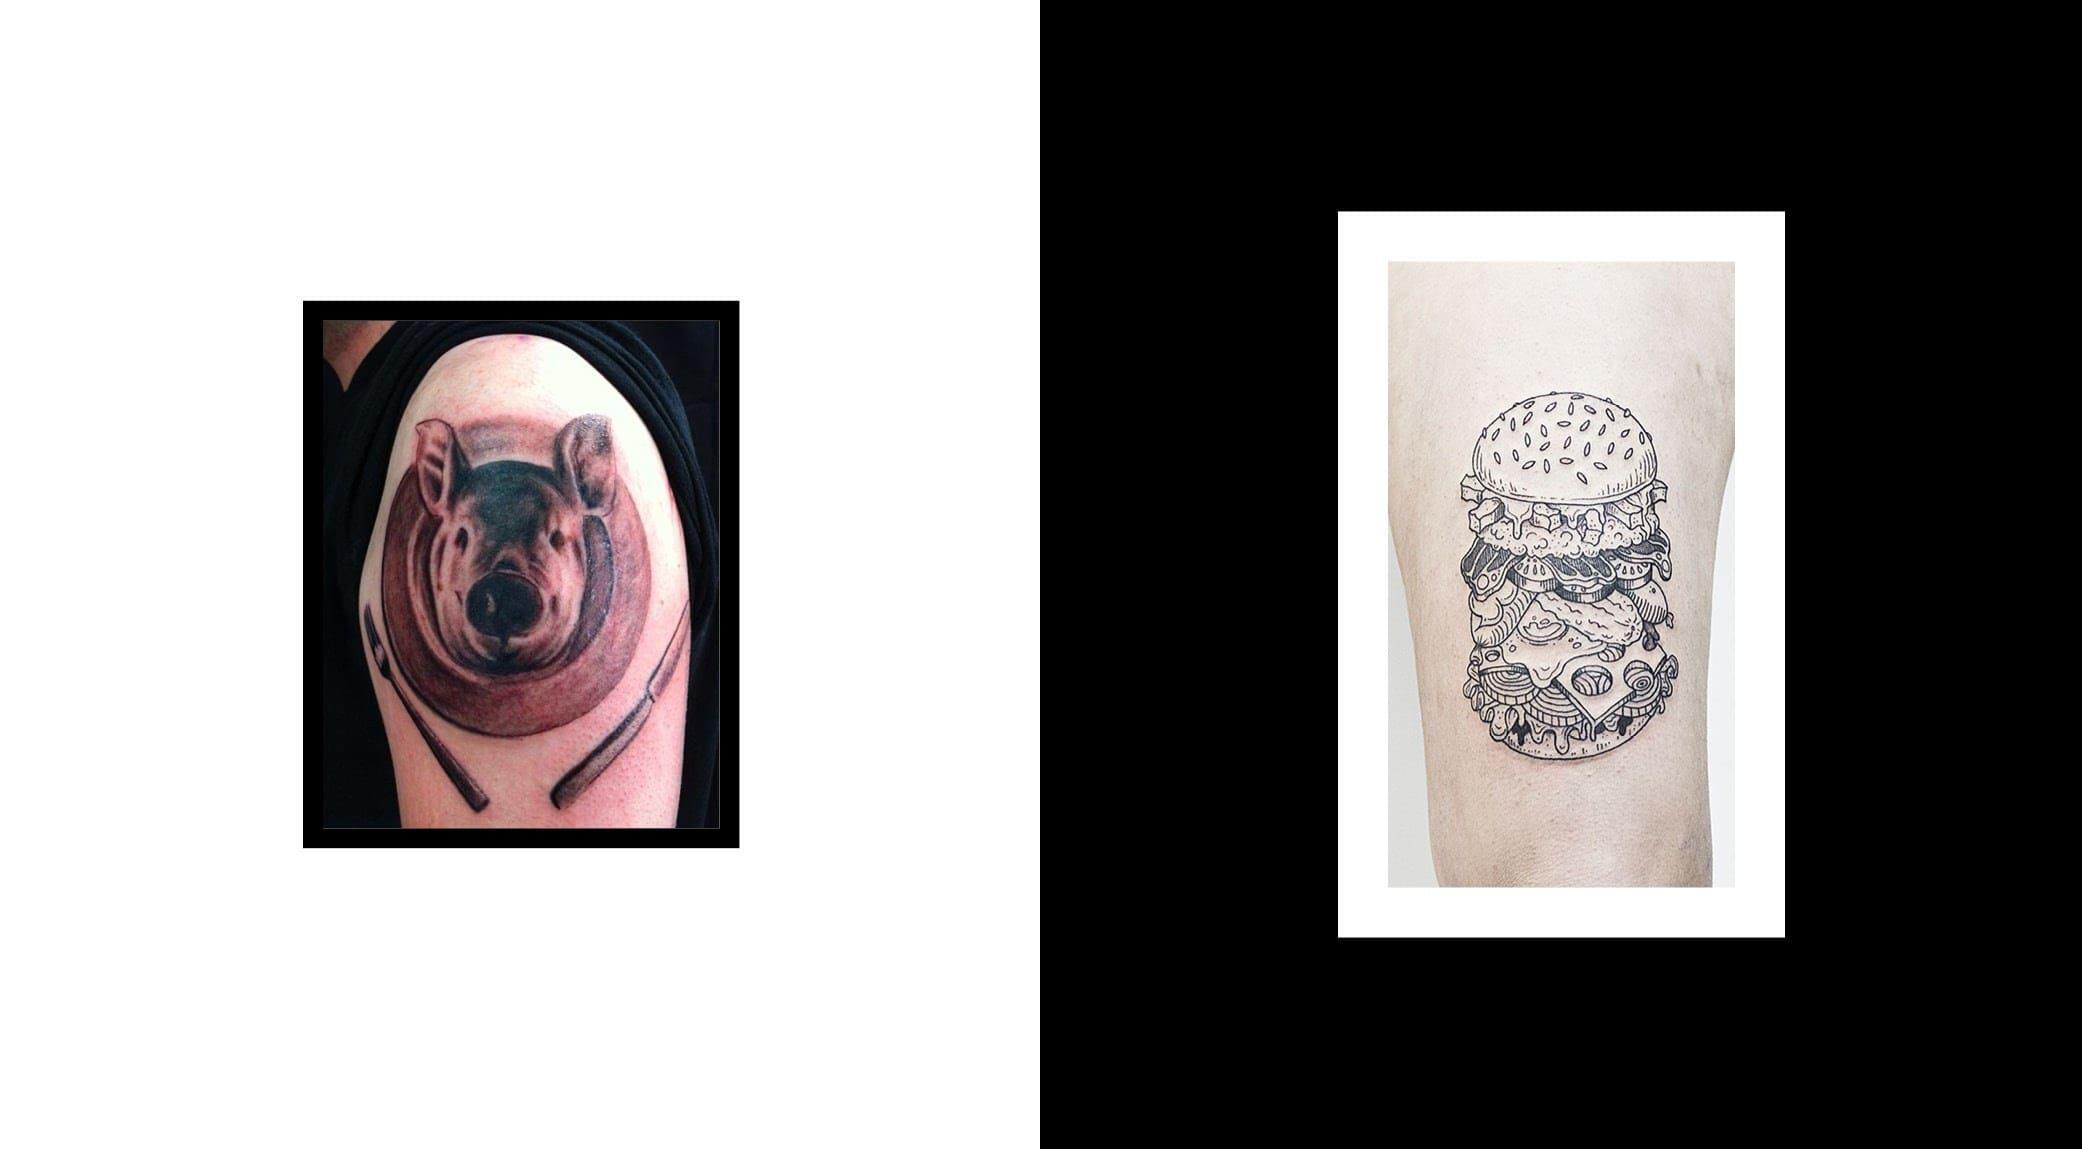 original_007-tattoo-finedininglovers7.jpg